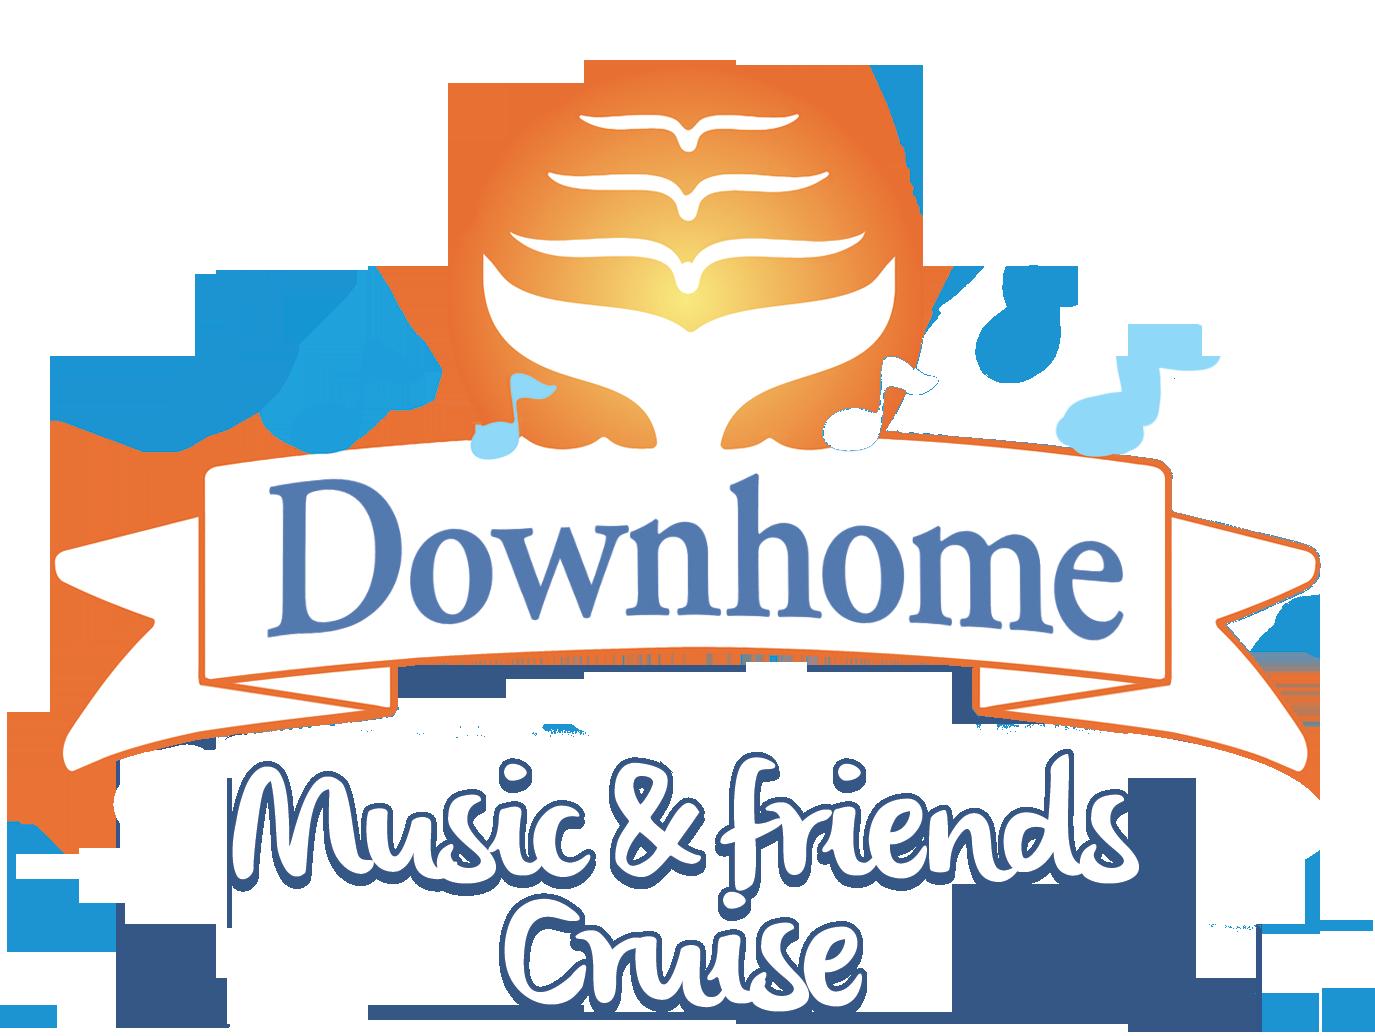 Downhome Cruise